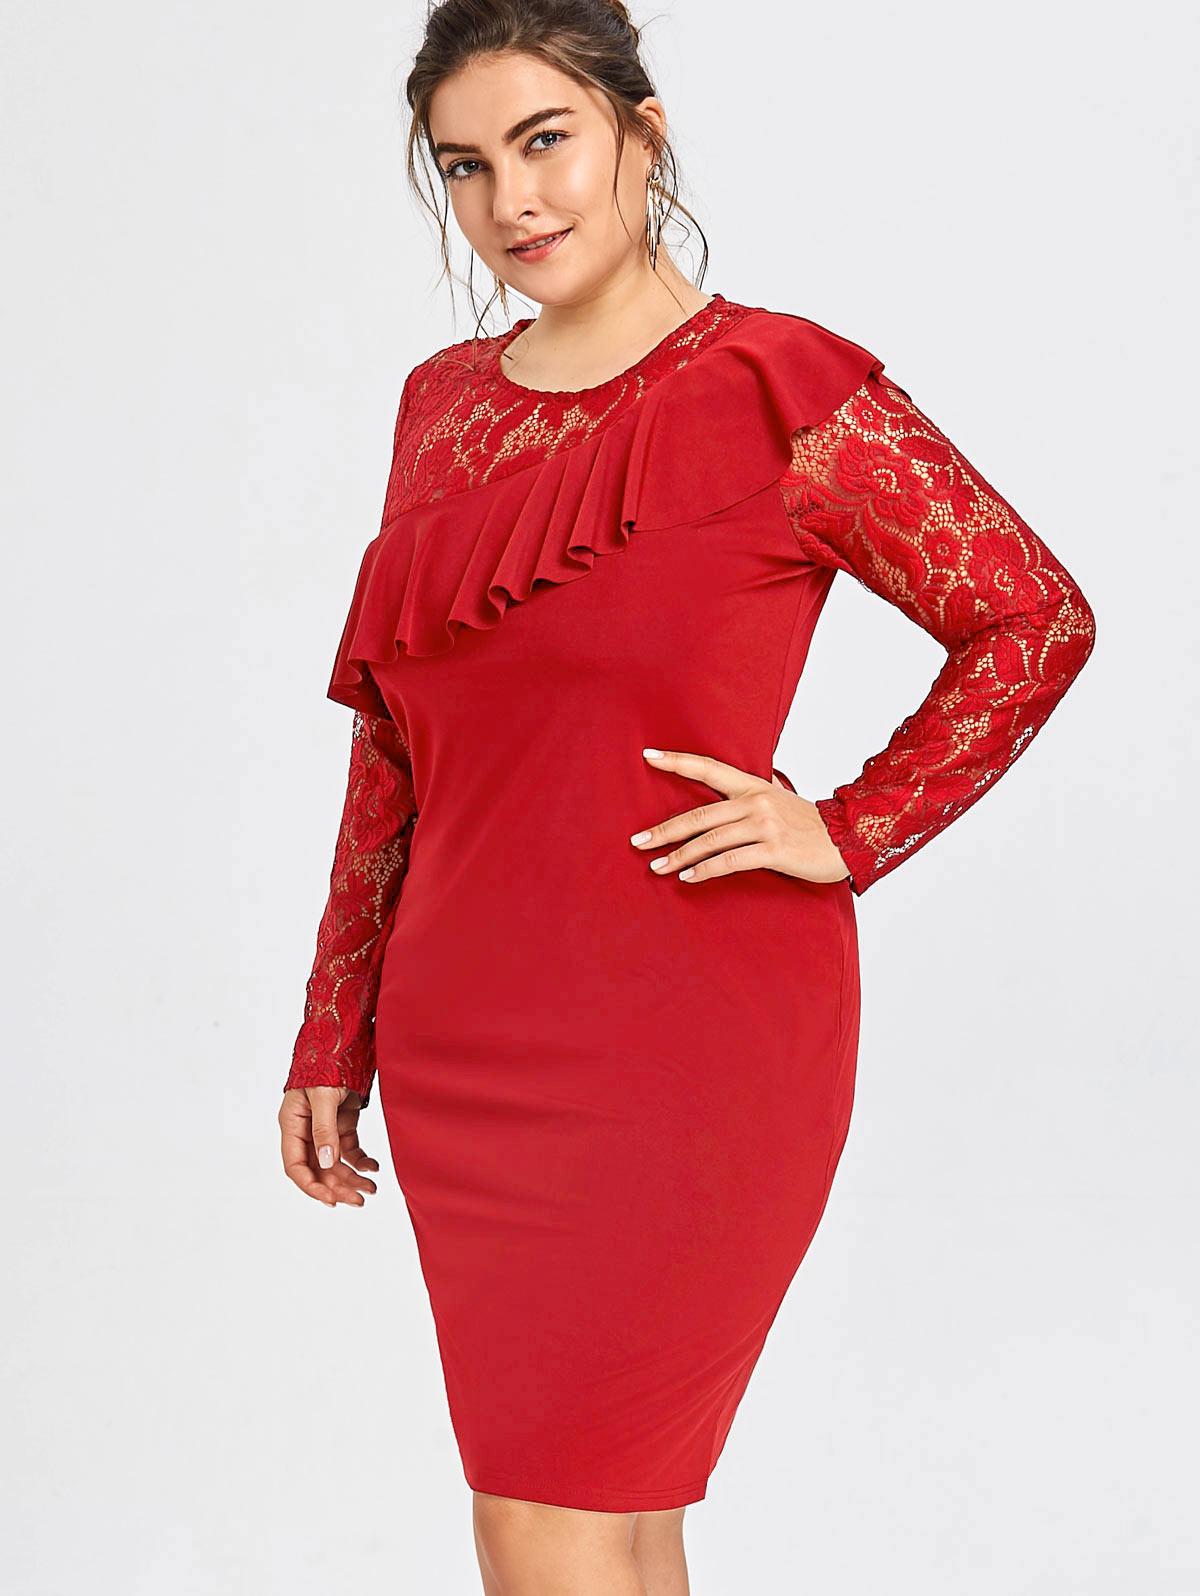 Wipalo New 2019 Fashion Dresses Plus Size 3XL-6XL Lace Insert Ruffle Semi Formal Dress Women Sexy Bobycon Party Dress Vestidos semi formal summer dresses